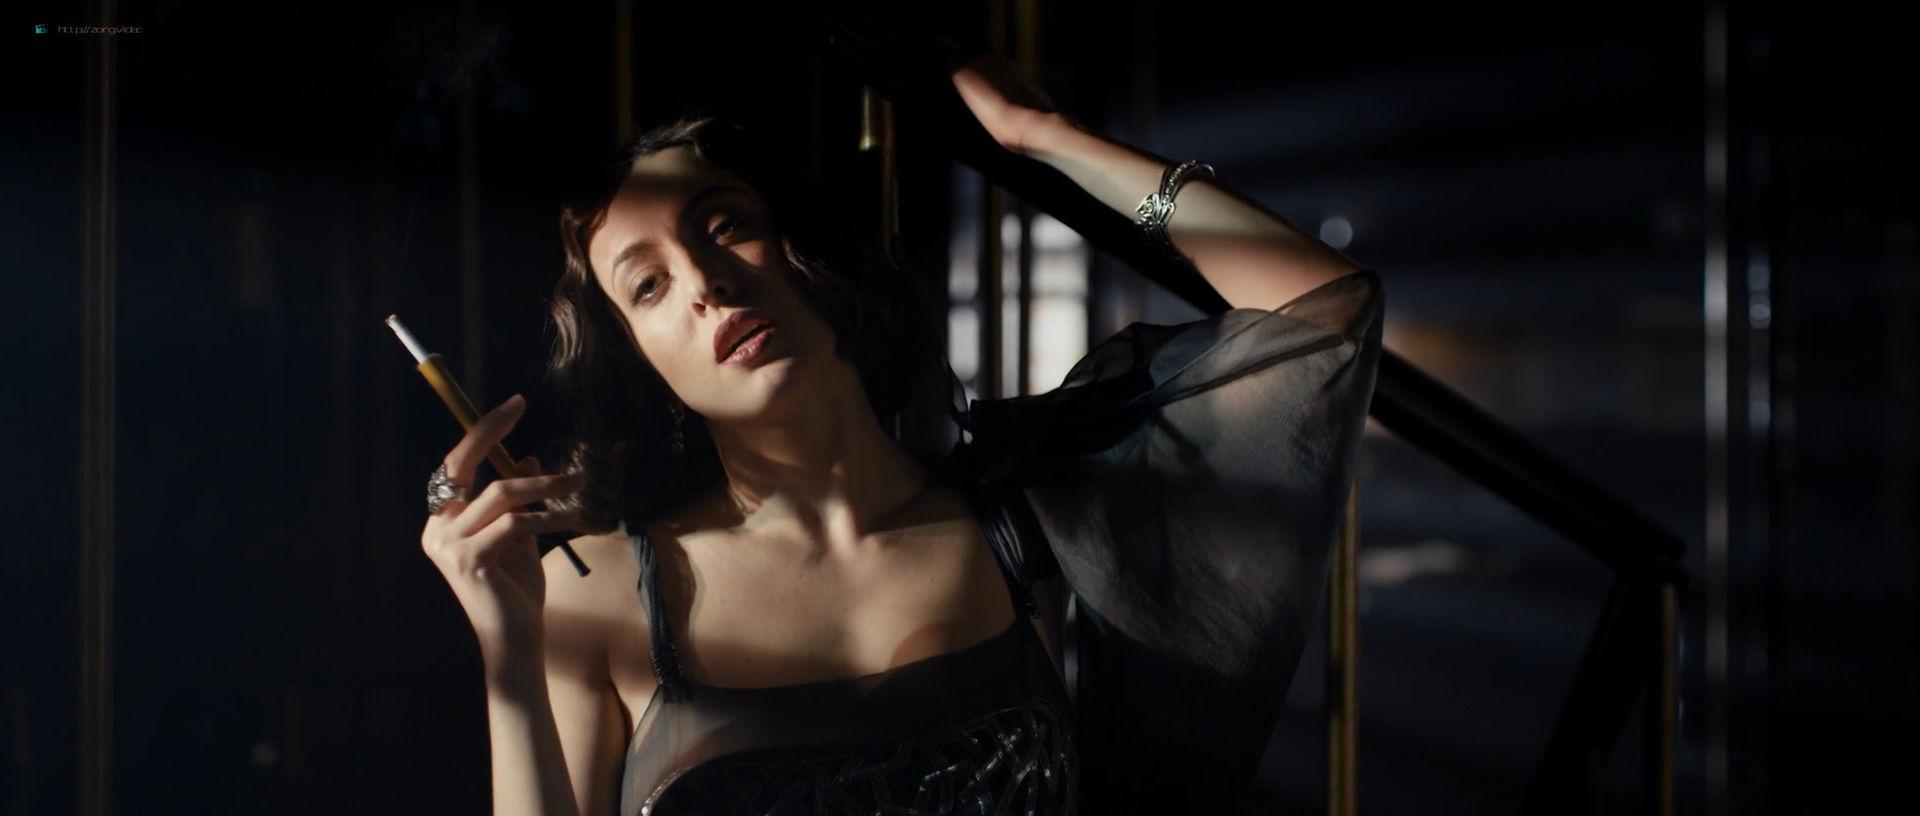 Anastasiya Meskova nude full frontal Olga Sutulova nude sex - Trotsky (2017) s1e1-2 HD 1080p (16)